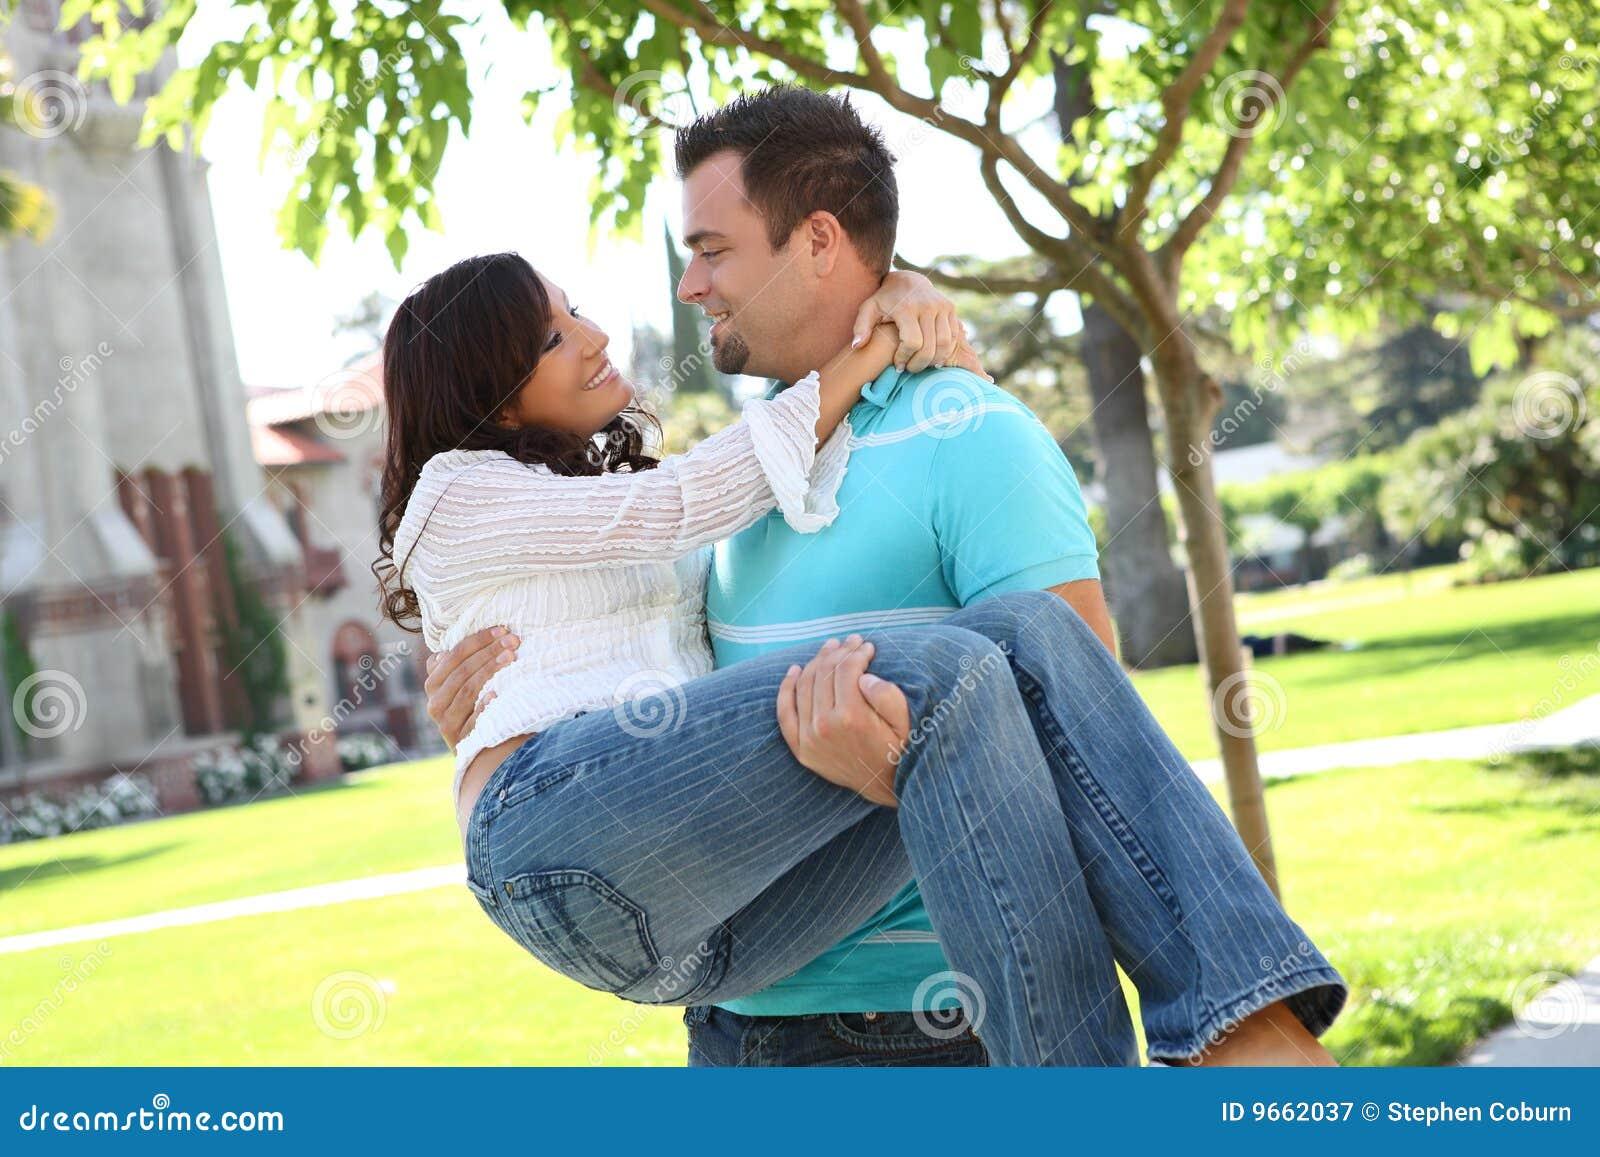 Sweet happy couple in love